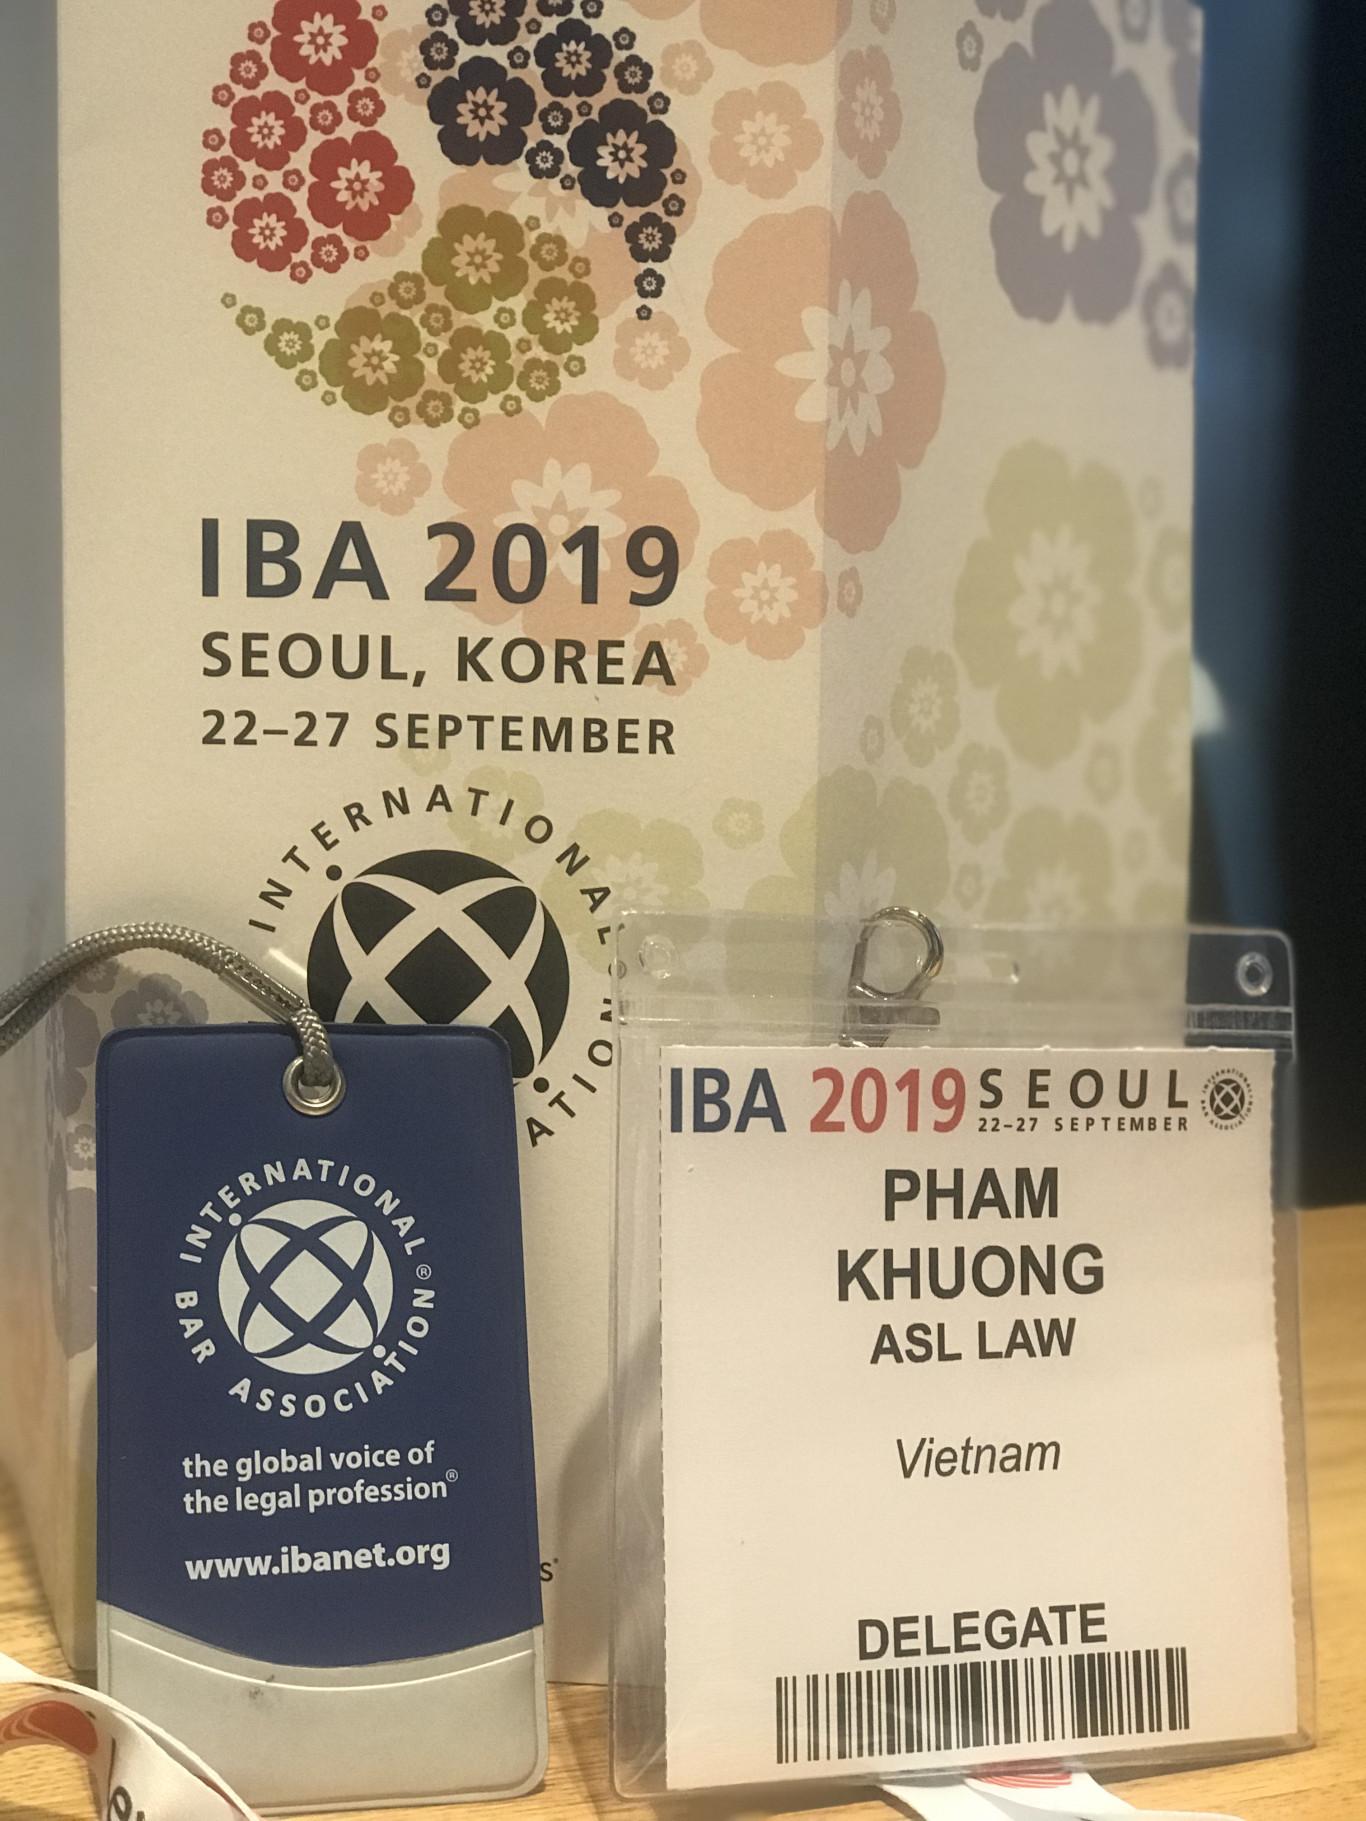 ASL LAW attended IBA 2019, Seoul. Vietnam International Law Firm. Vietnam Law Firm